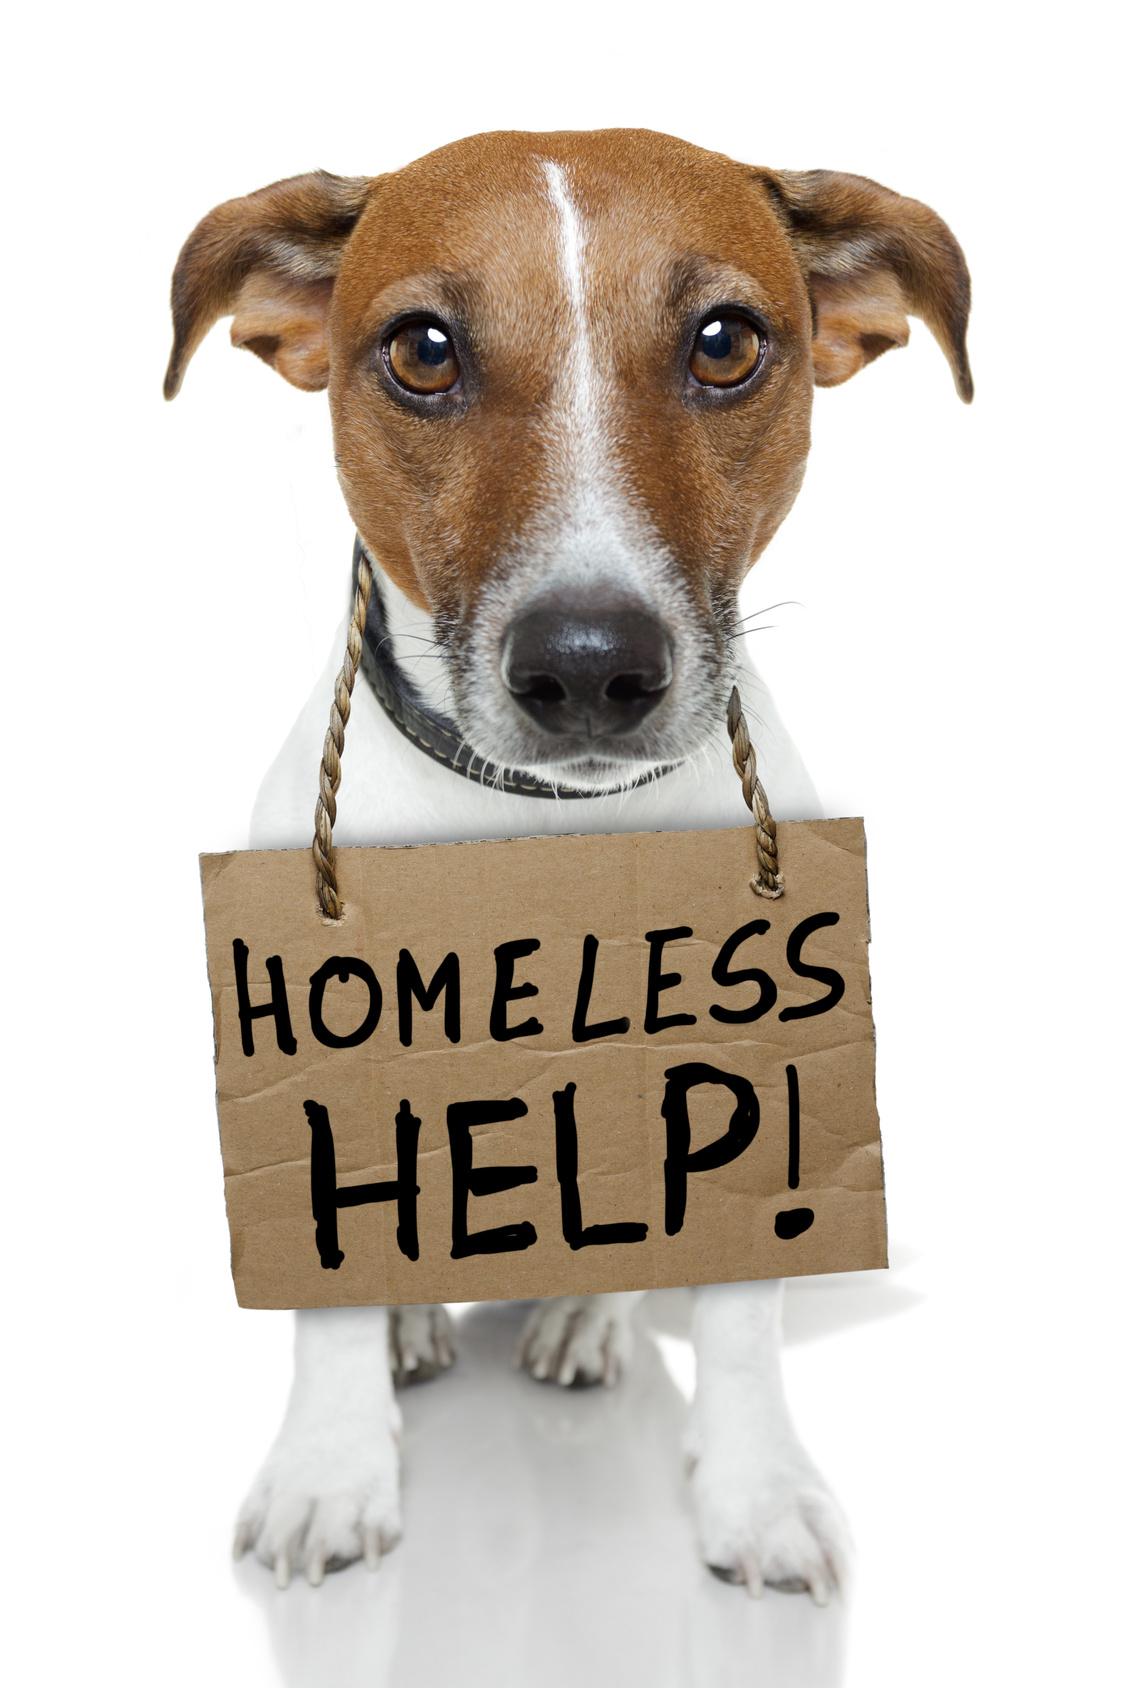 Donating Dog Food Homeless